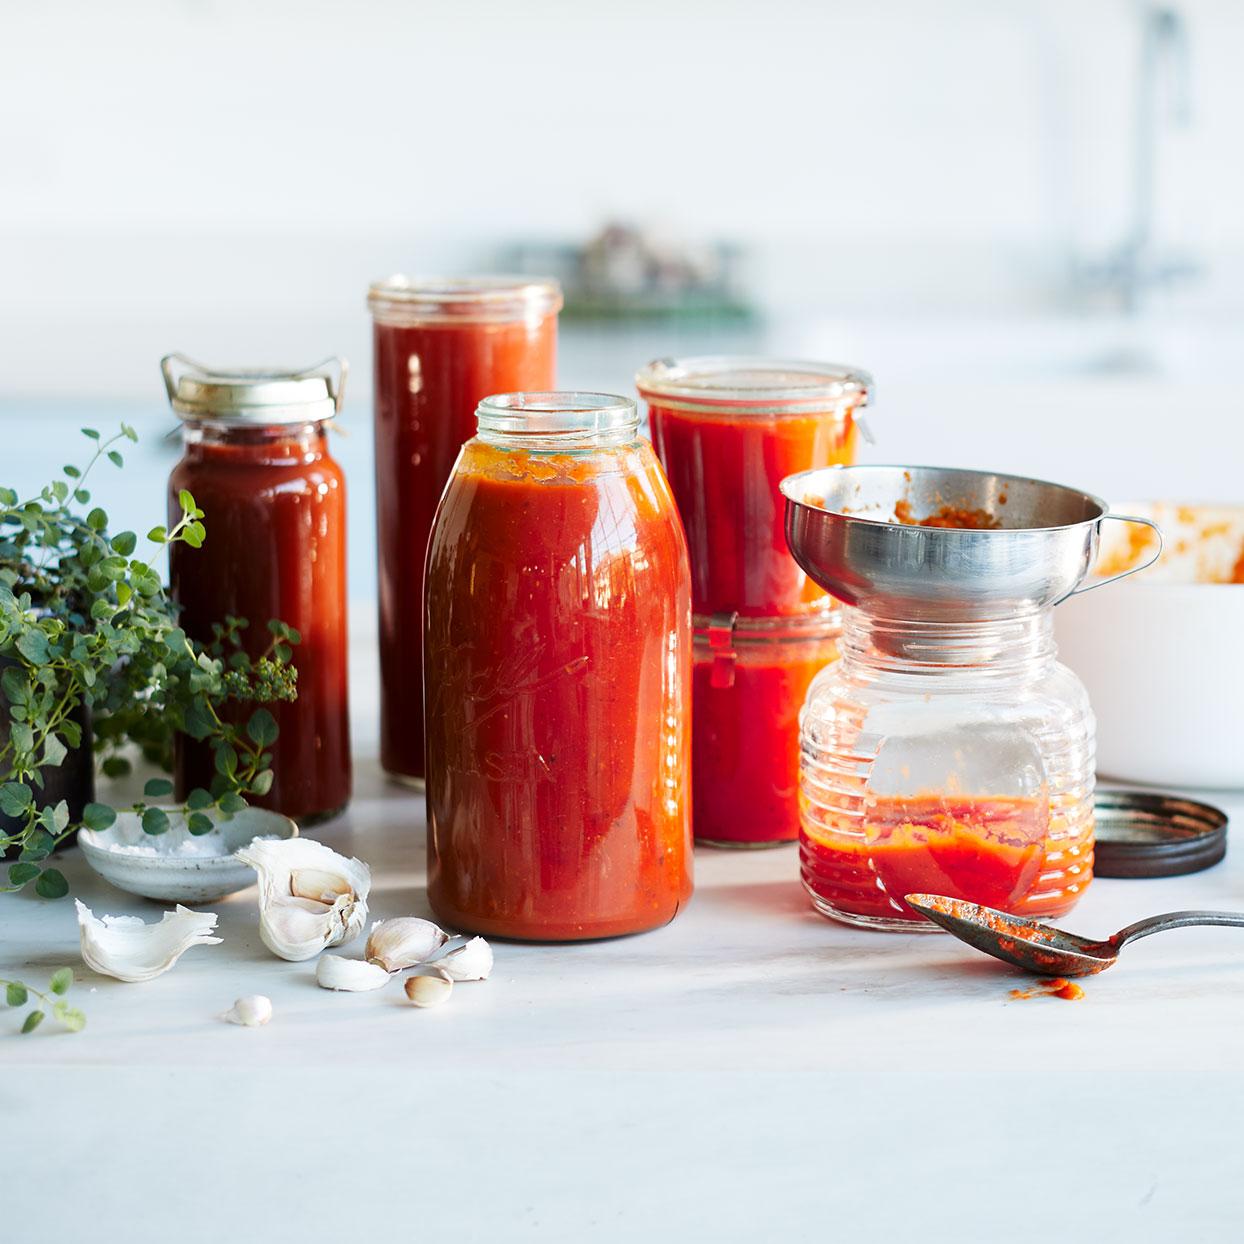 No-Peel Slow-Cooker Marinara Sauce Allrecipes Trusted Brands